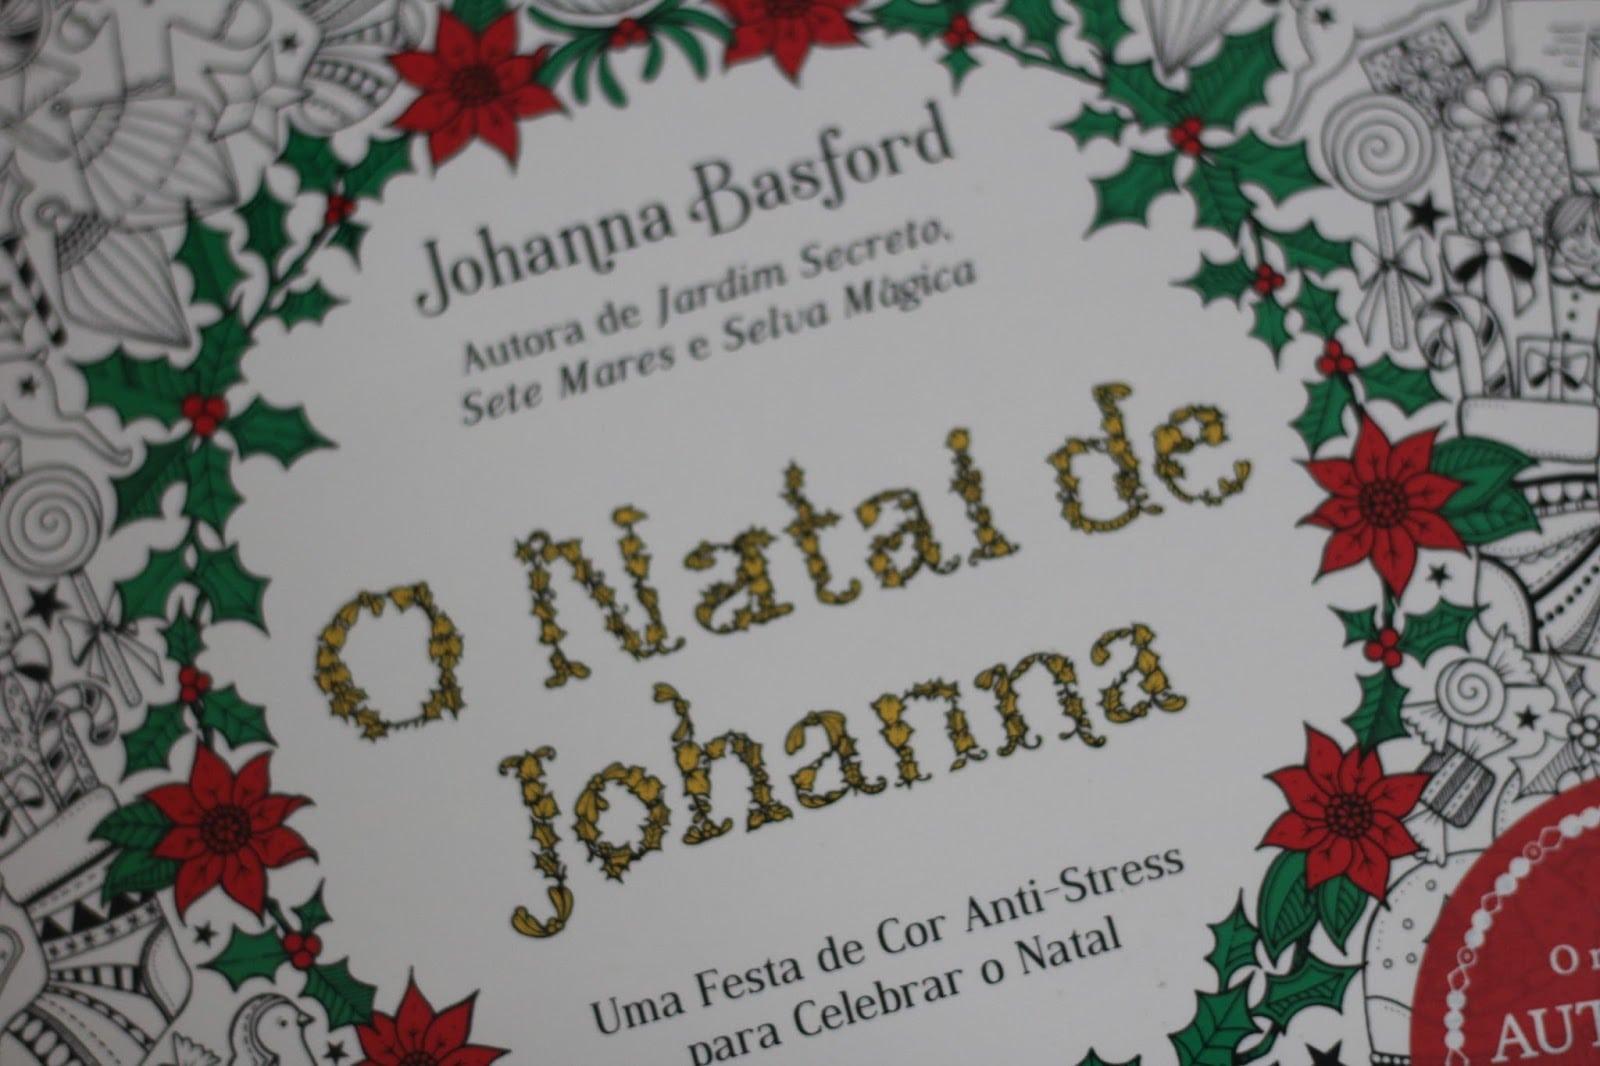 Natal Presentes Com Pi On Johanna Basford Johannas Christmas By